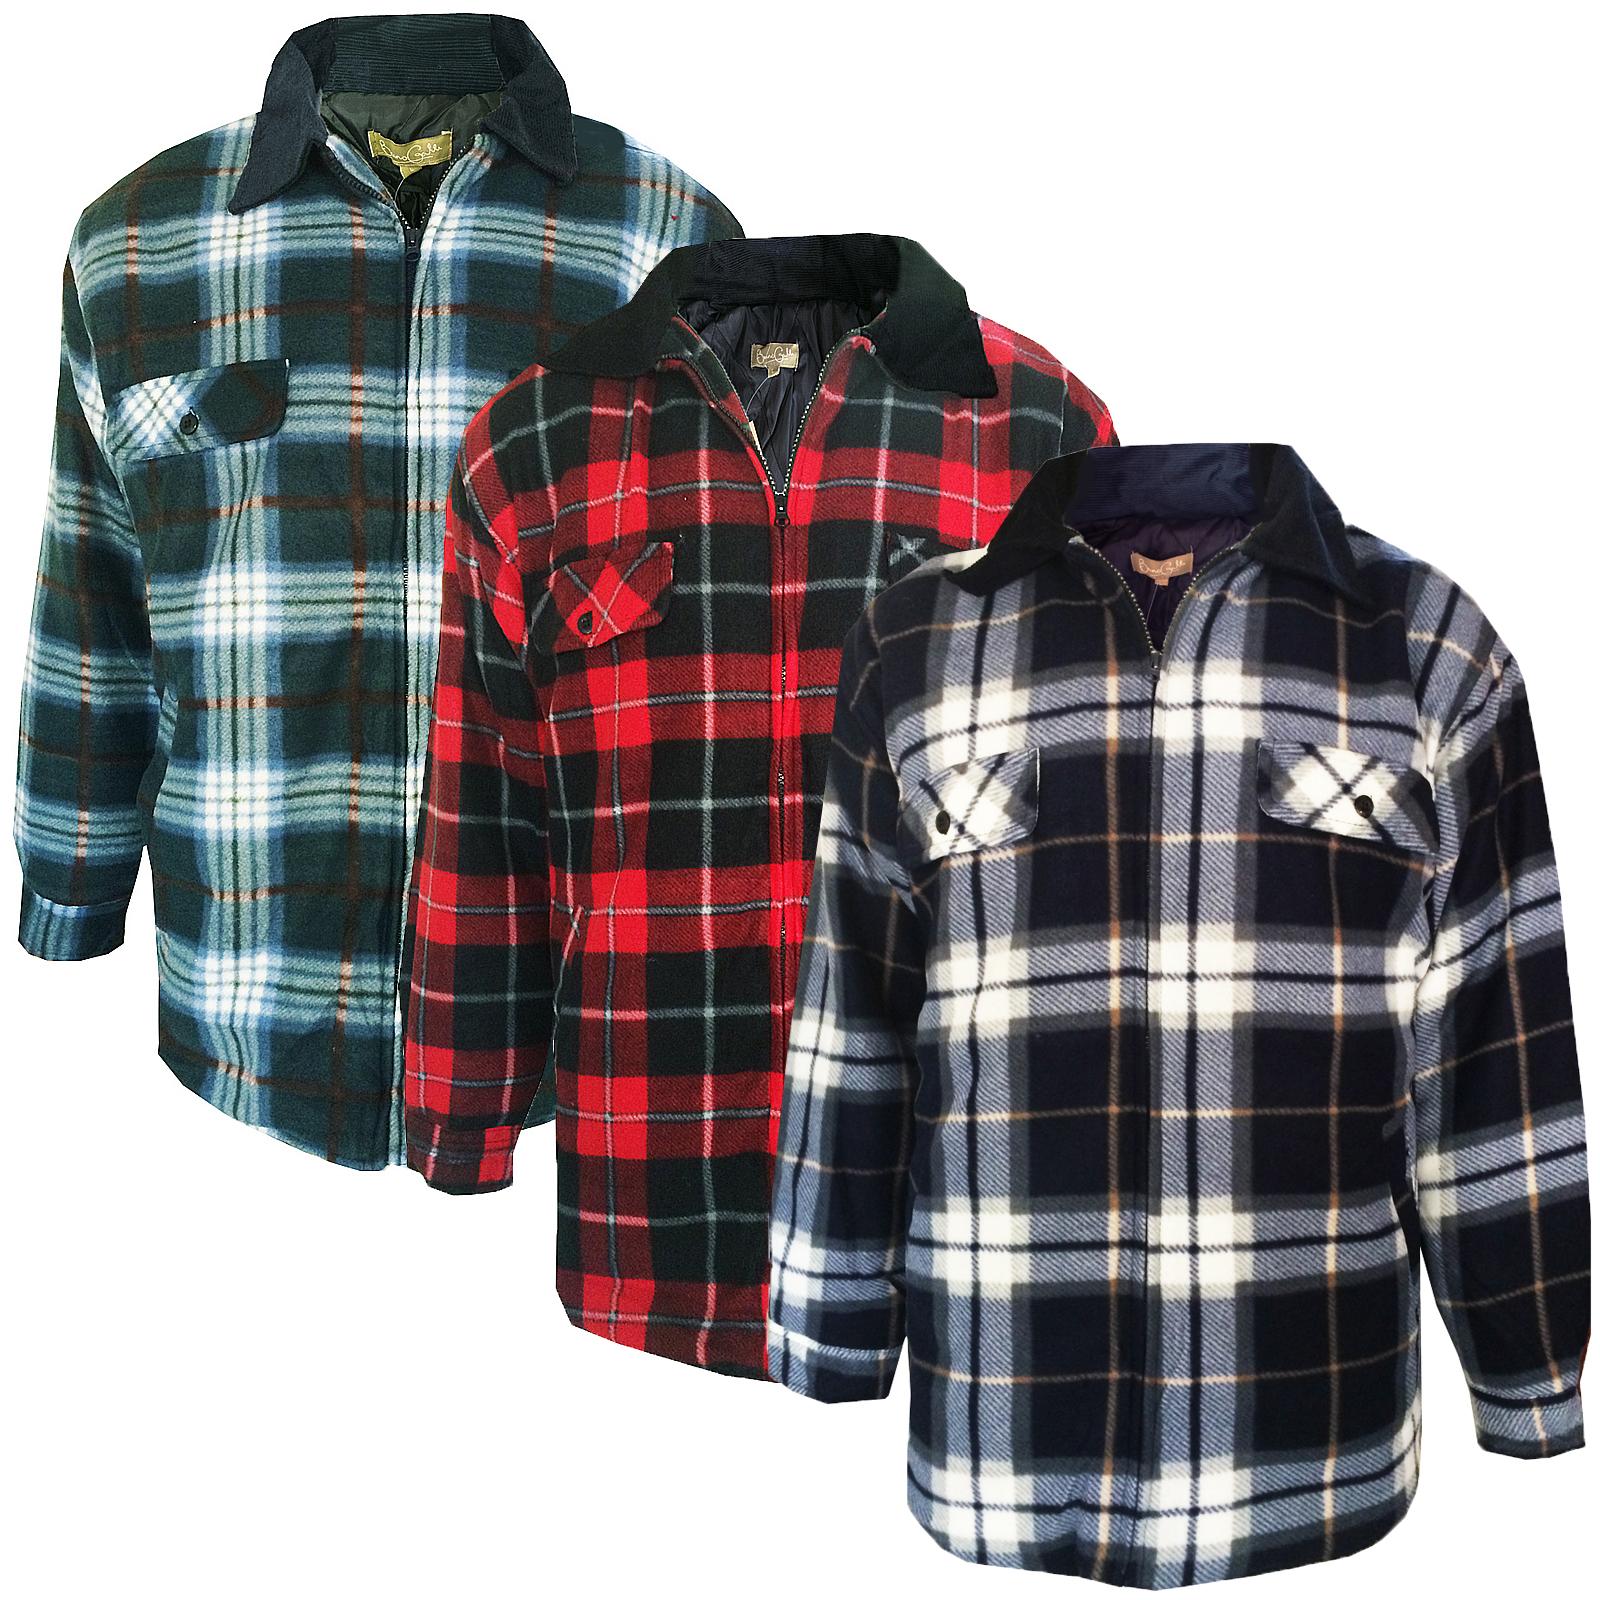 Lumberjack Jacket | eBay